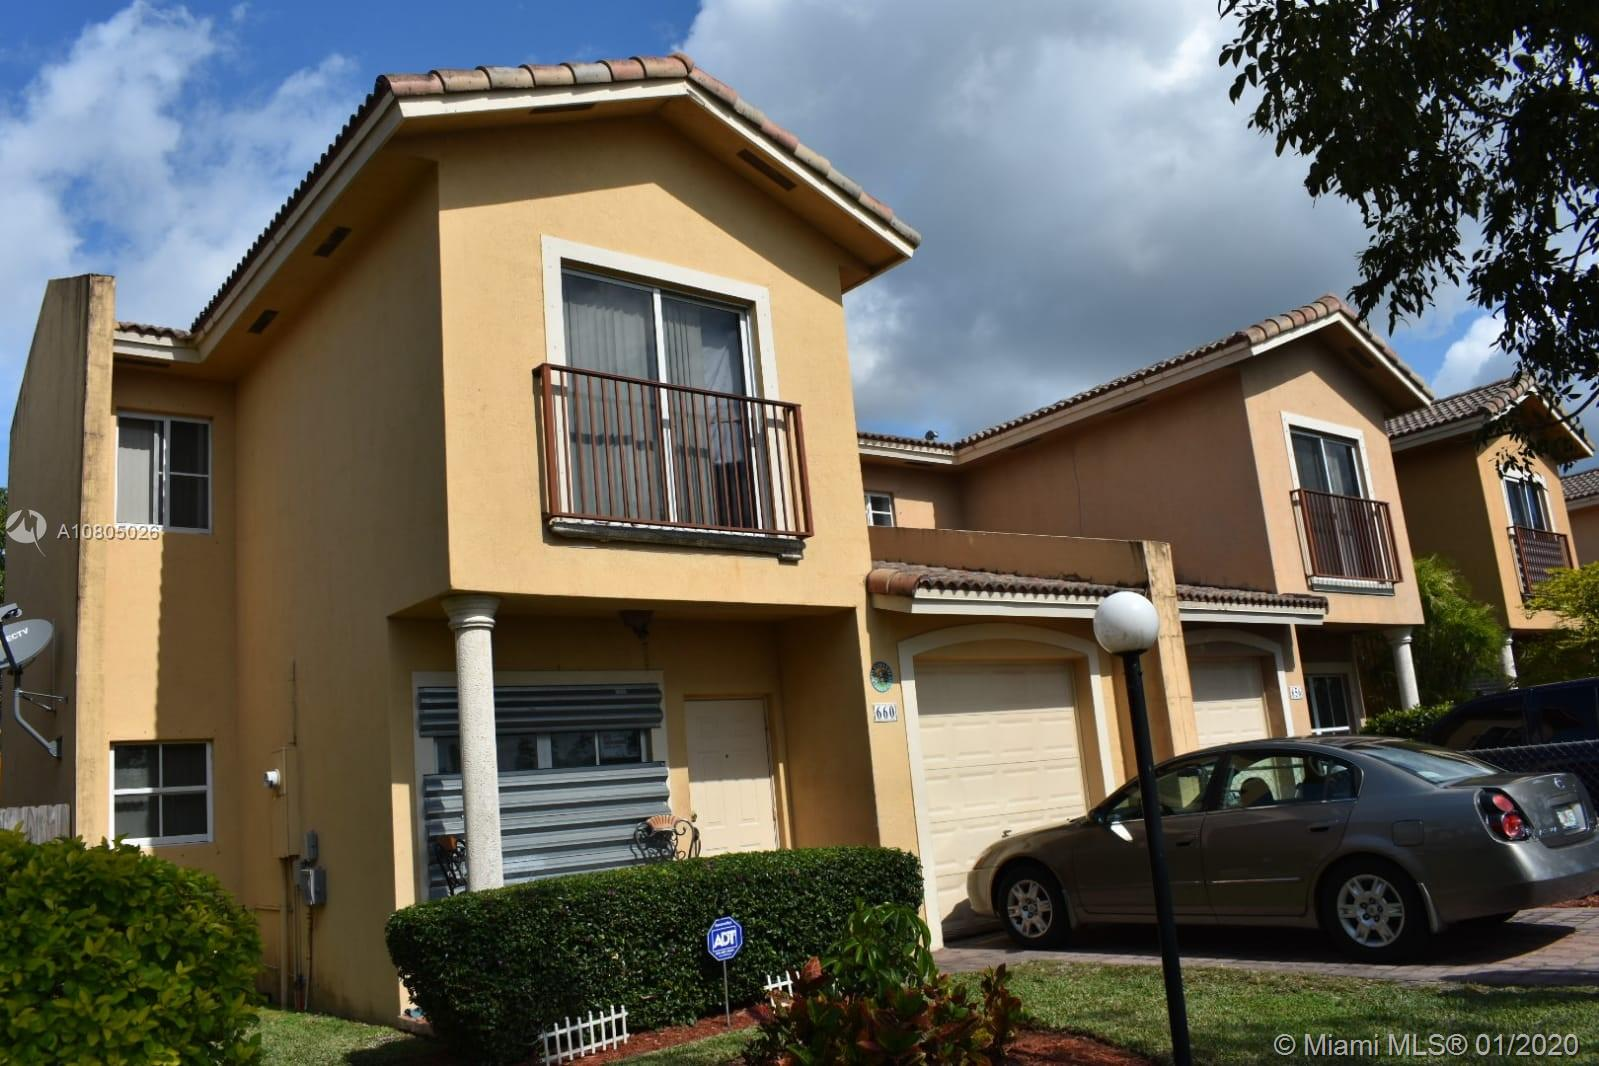 988 SW 6th Ct, Florida City, FL 33034 - Florida City, FL real estate listing